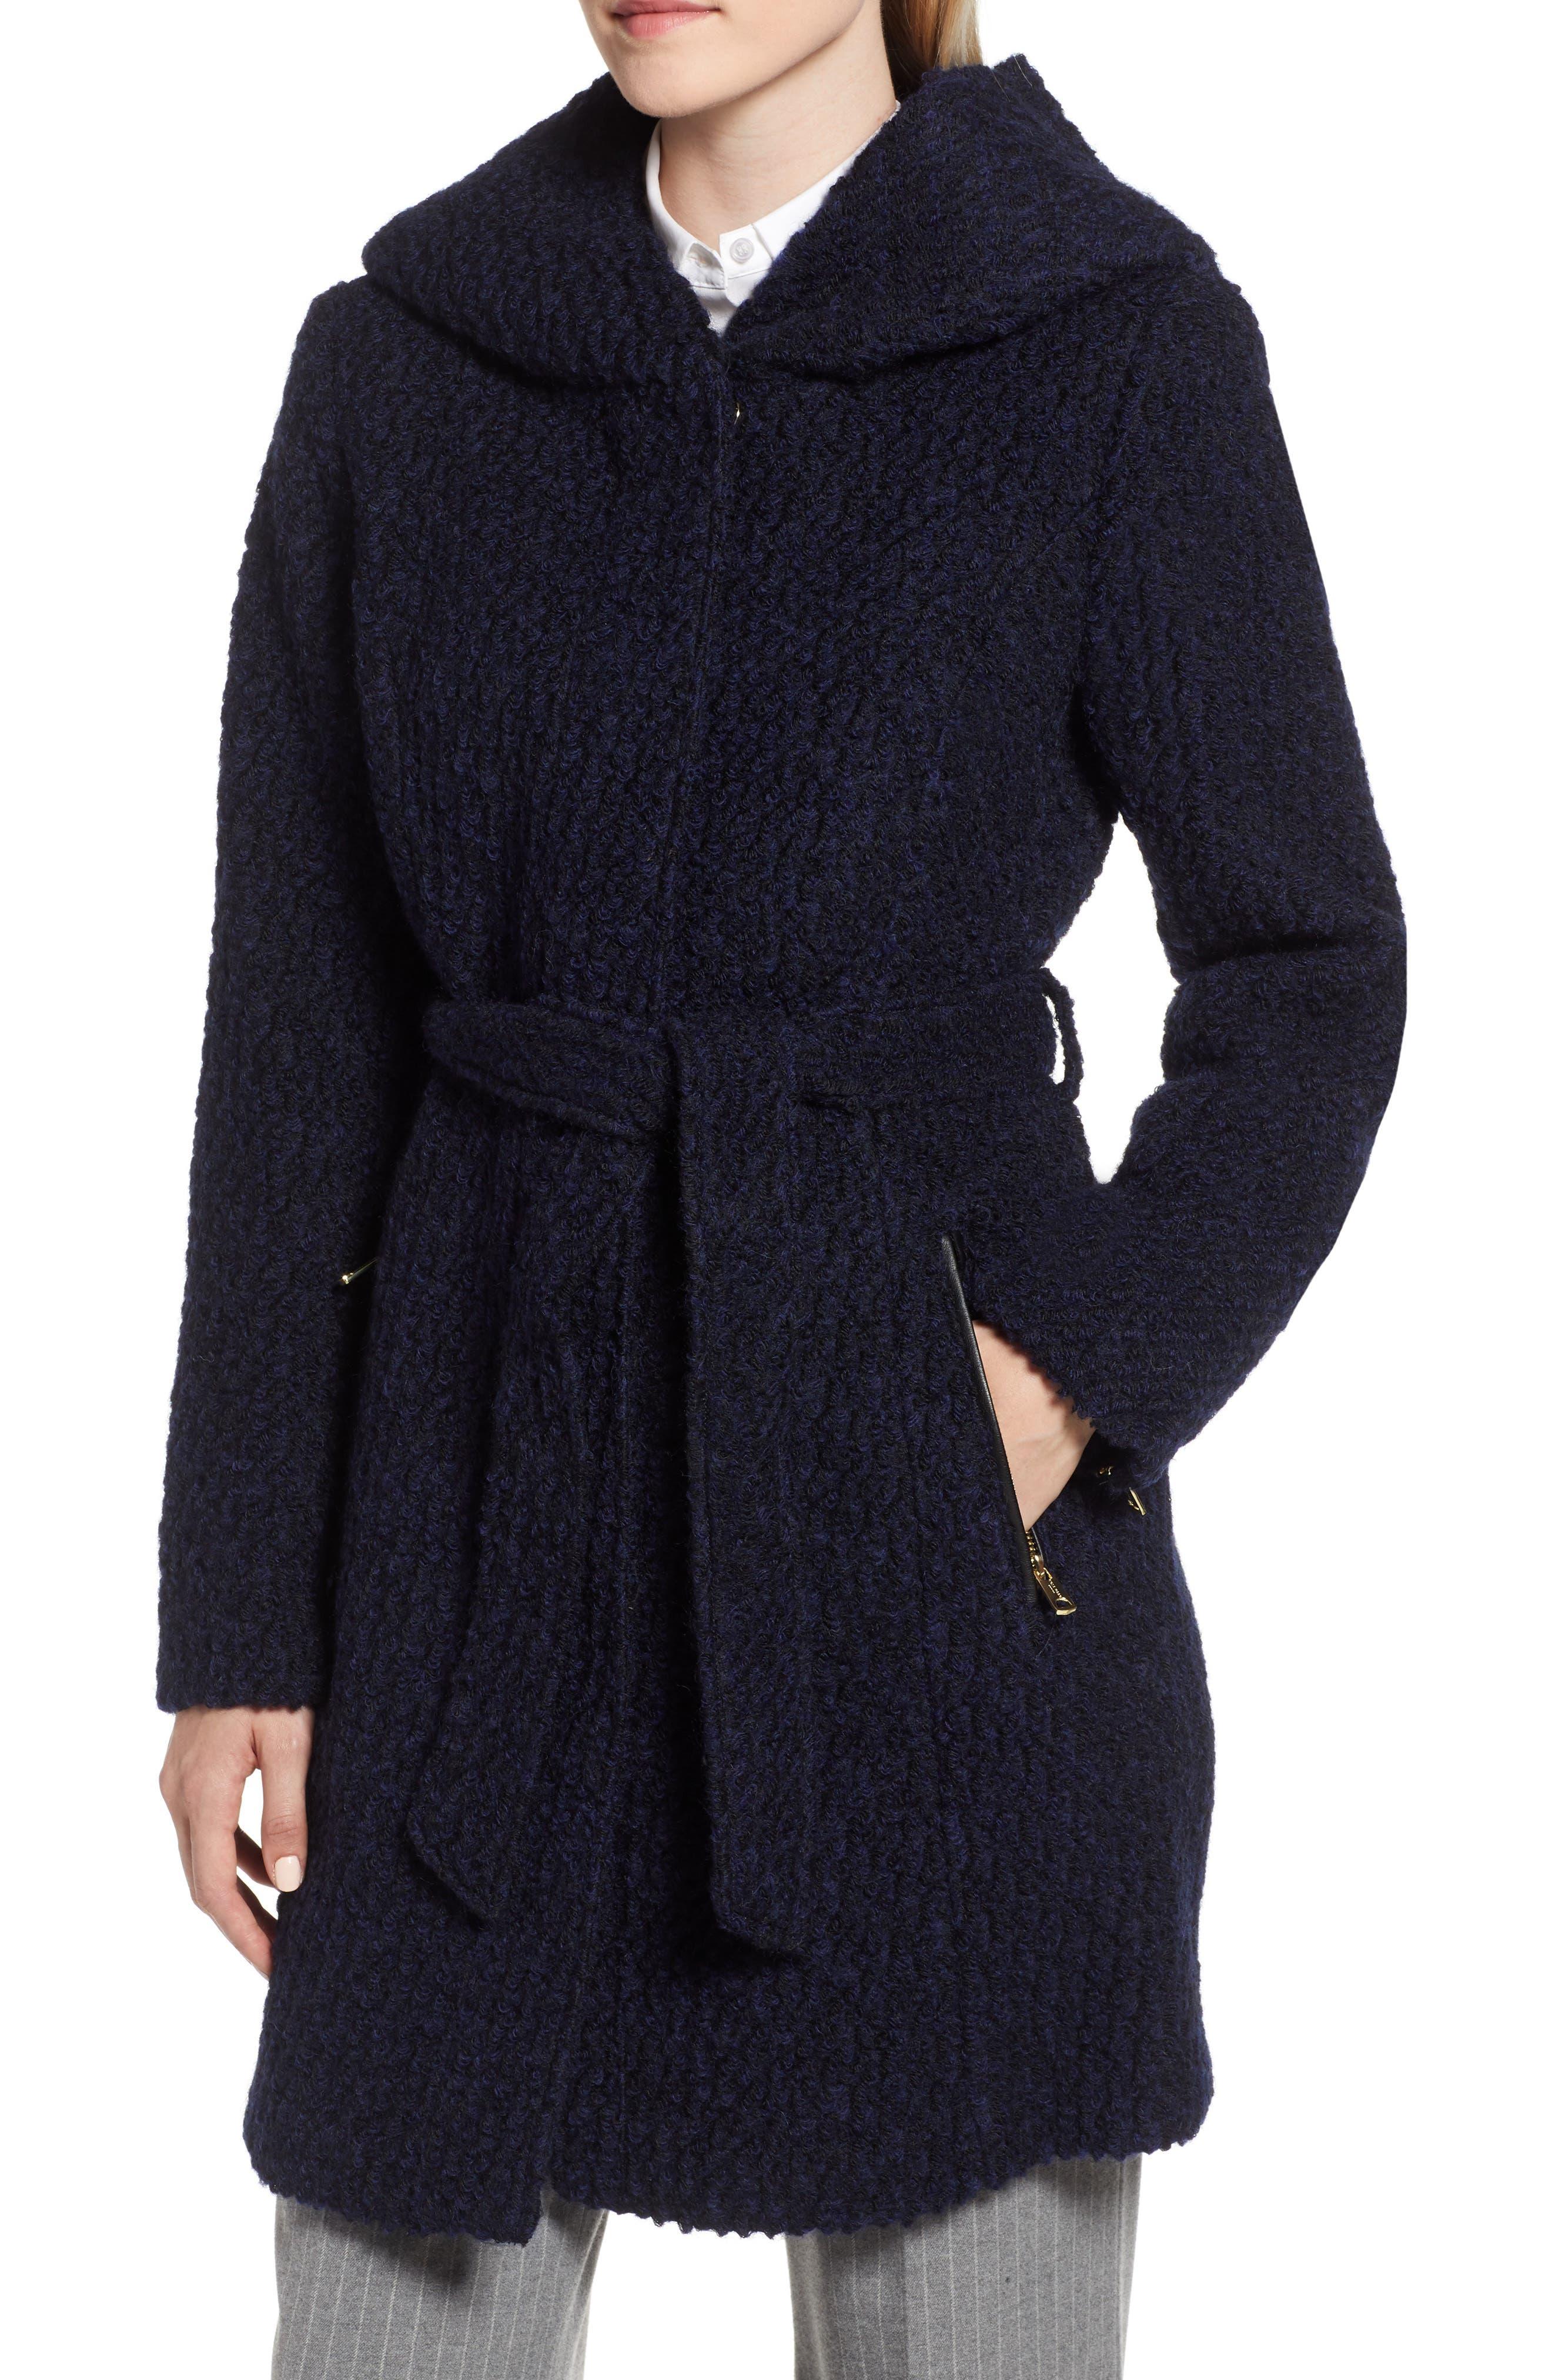 Belted Bouclé Wool Blend Coat,                             Alternate thumbnail 4, color,                             BLACK/ NAVY